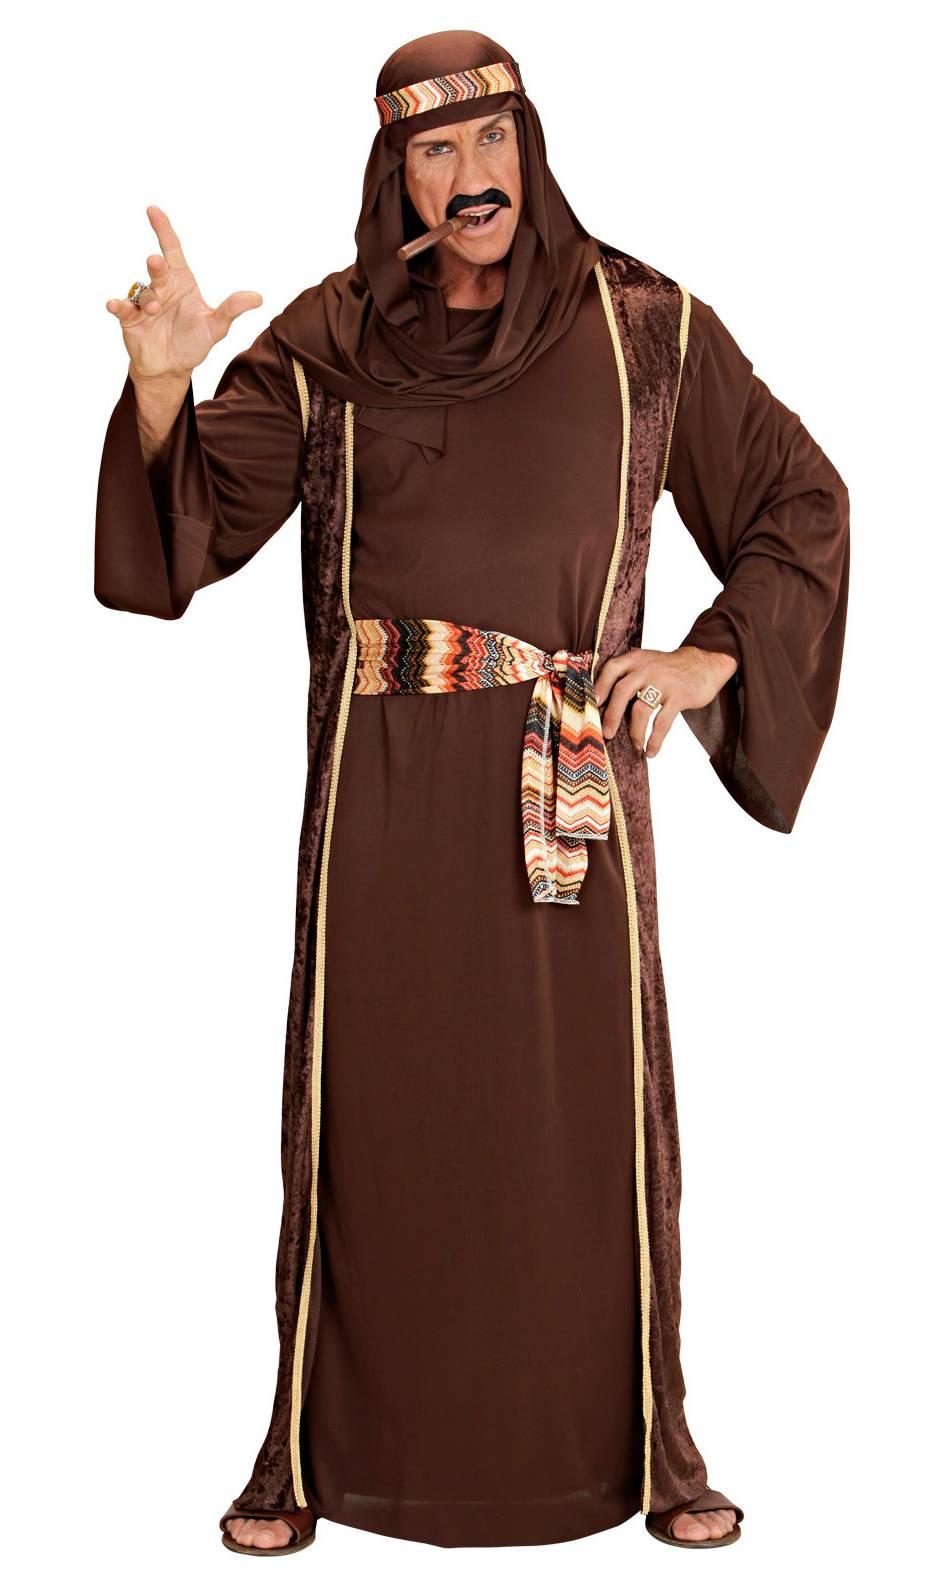 Costume sheik marron homme